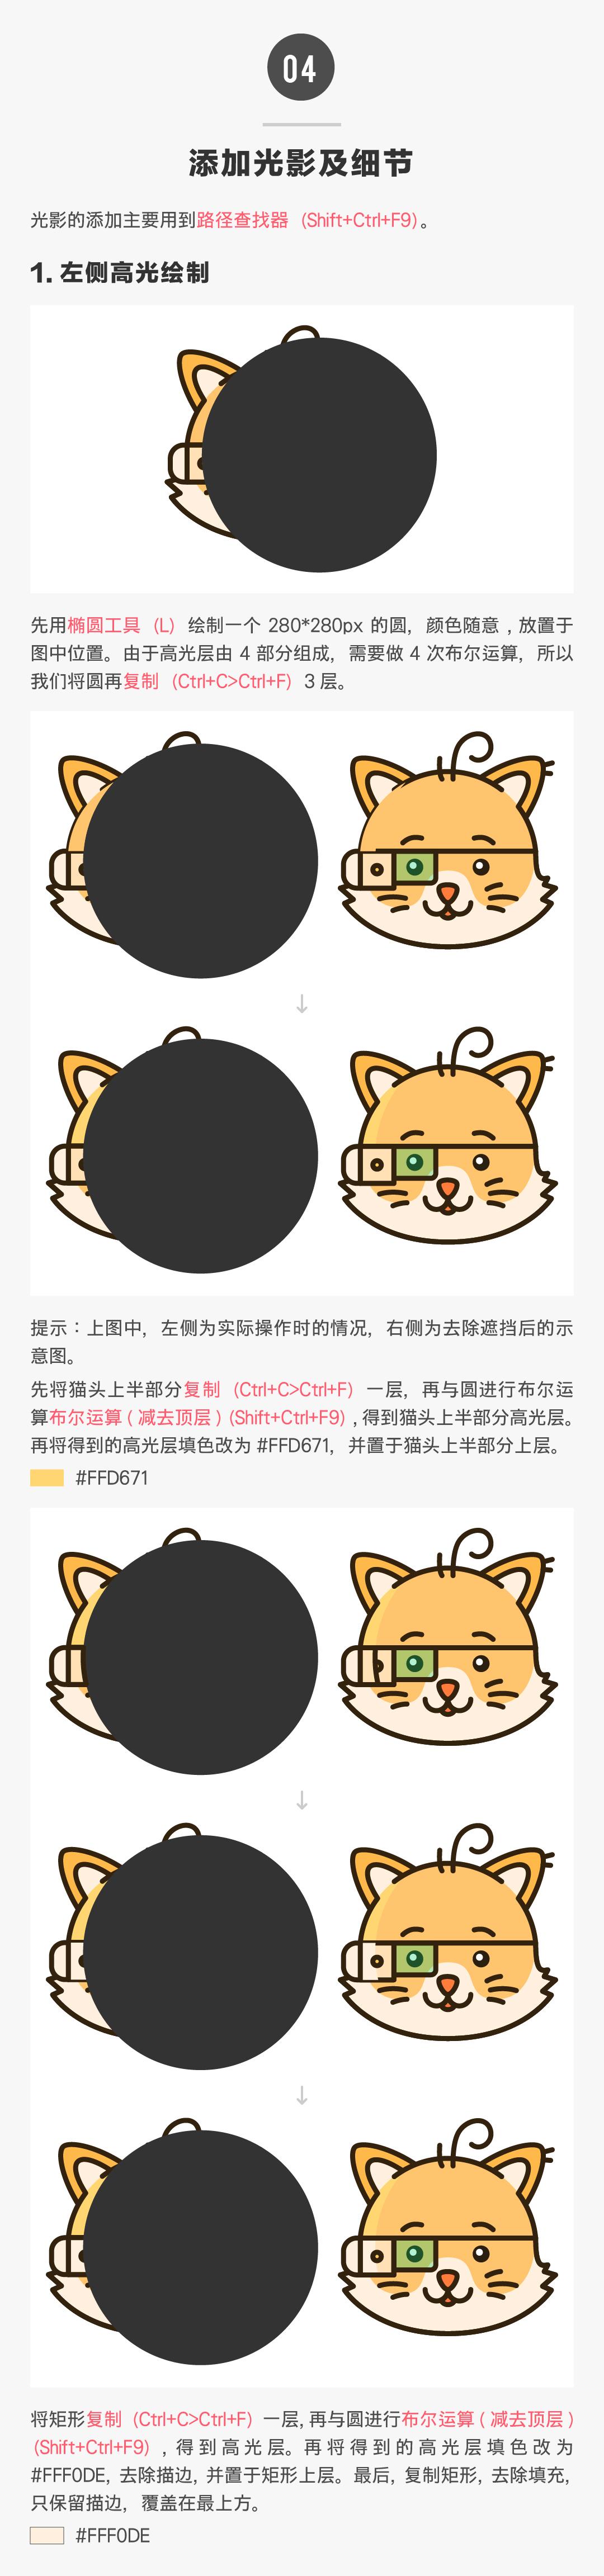 Illustrator详解卡通图形的描边技巧,PS教程,素材中国网